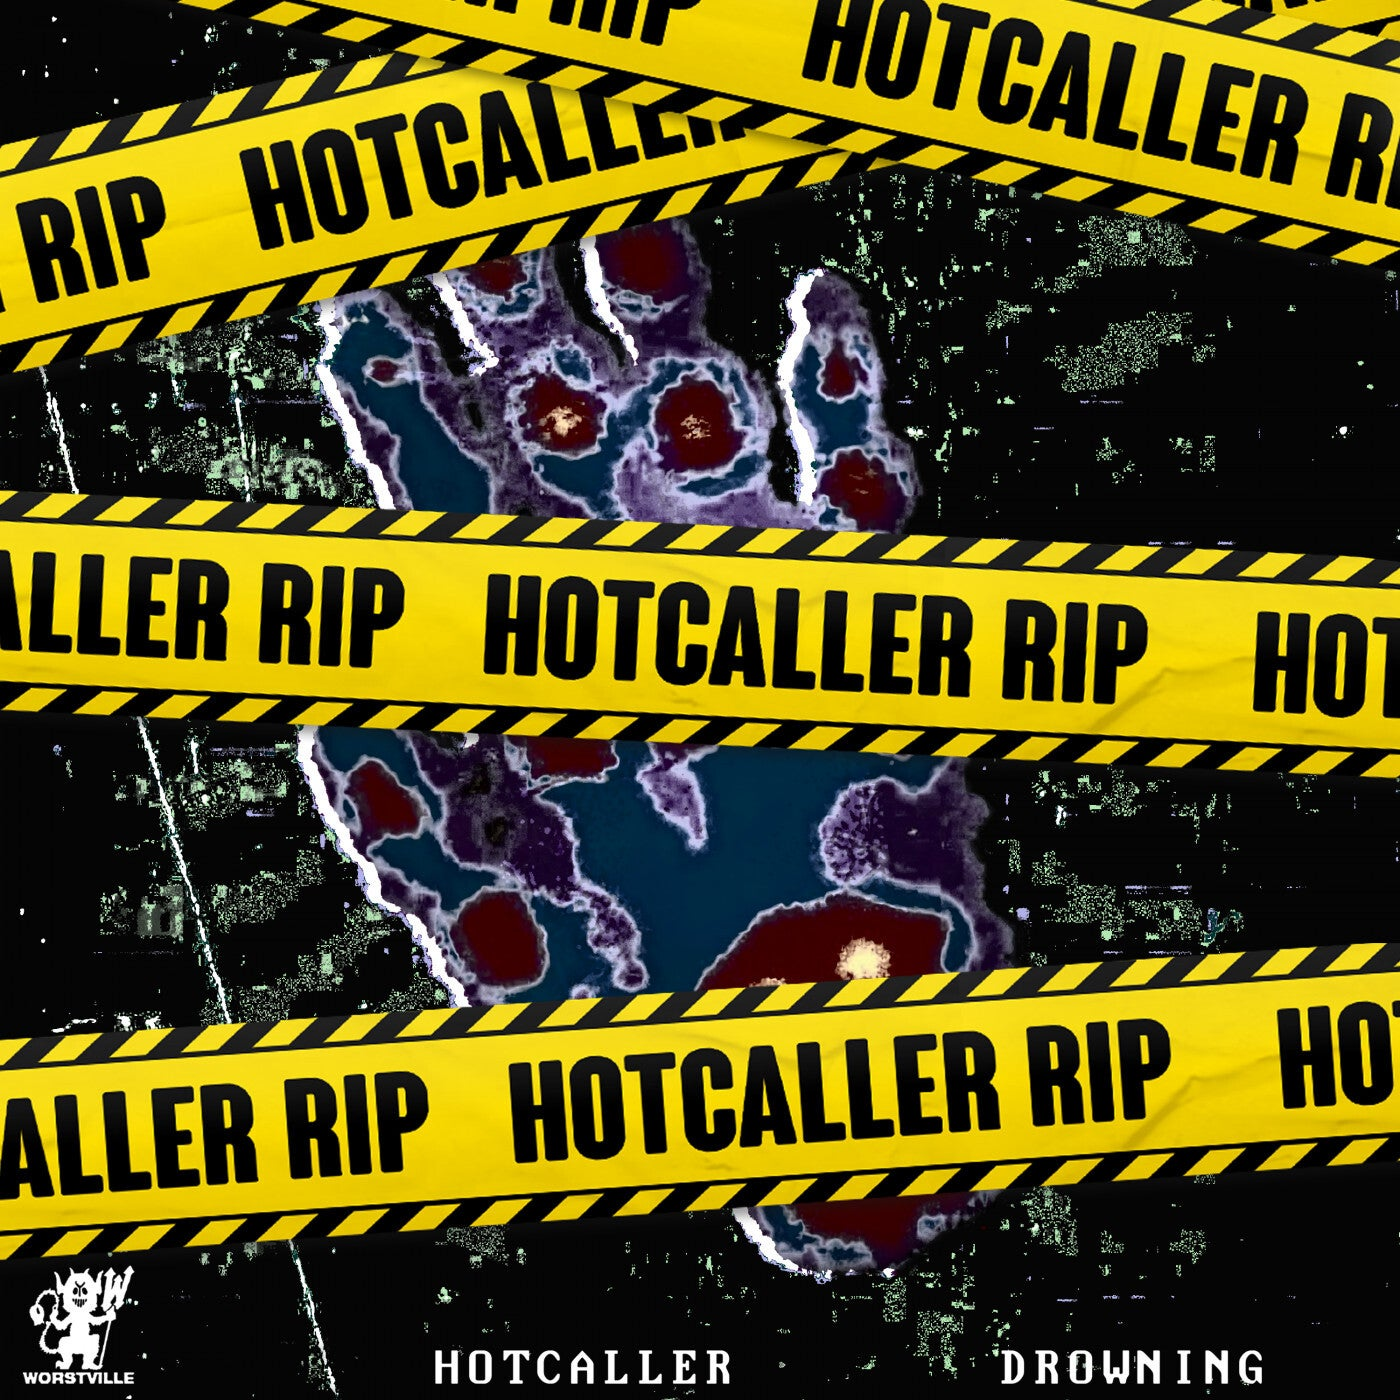 Drowning (Hotcaller RIP)